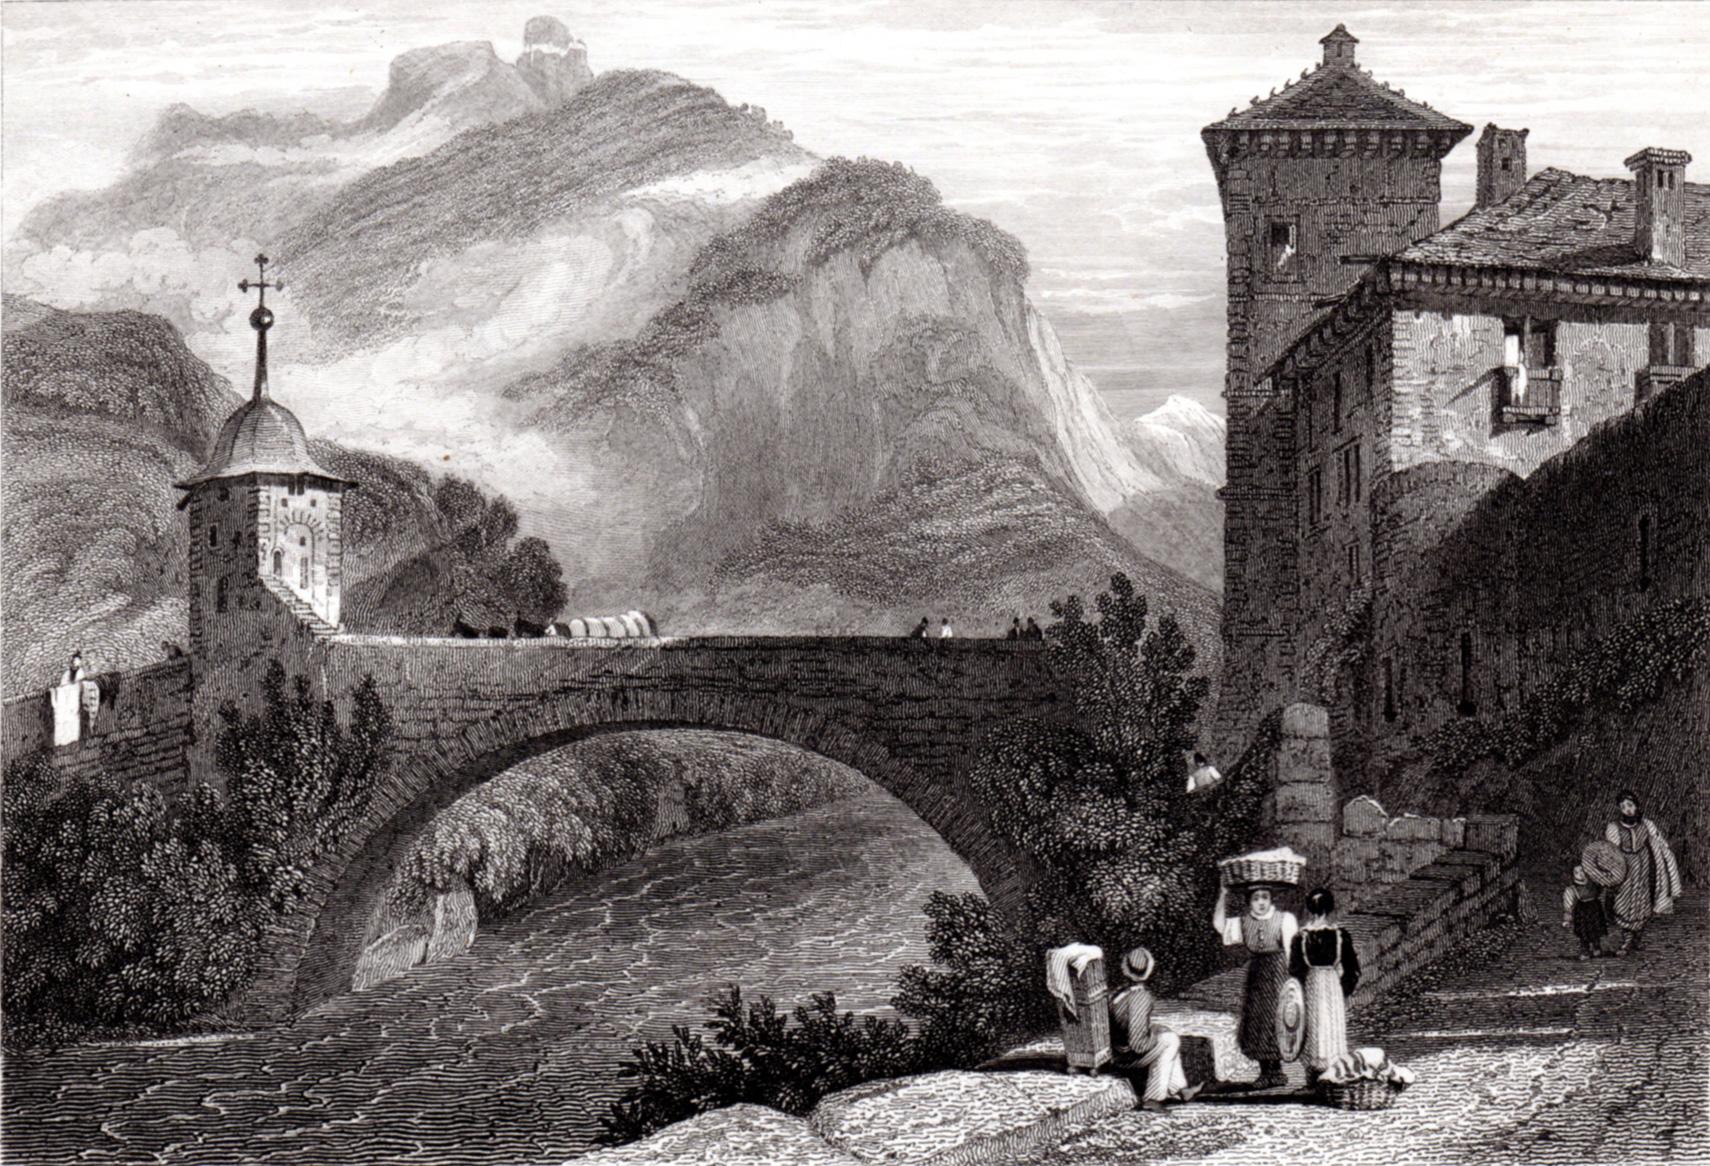 Miscellaneous antique prints of Switzerland